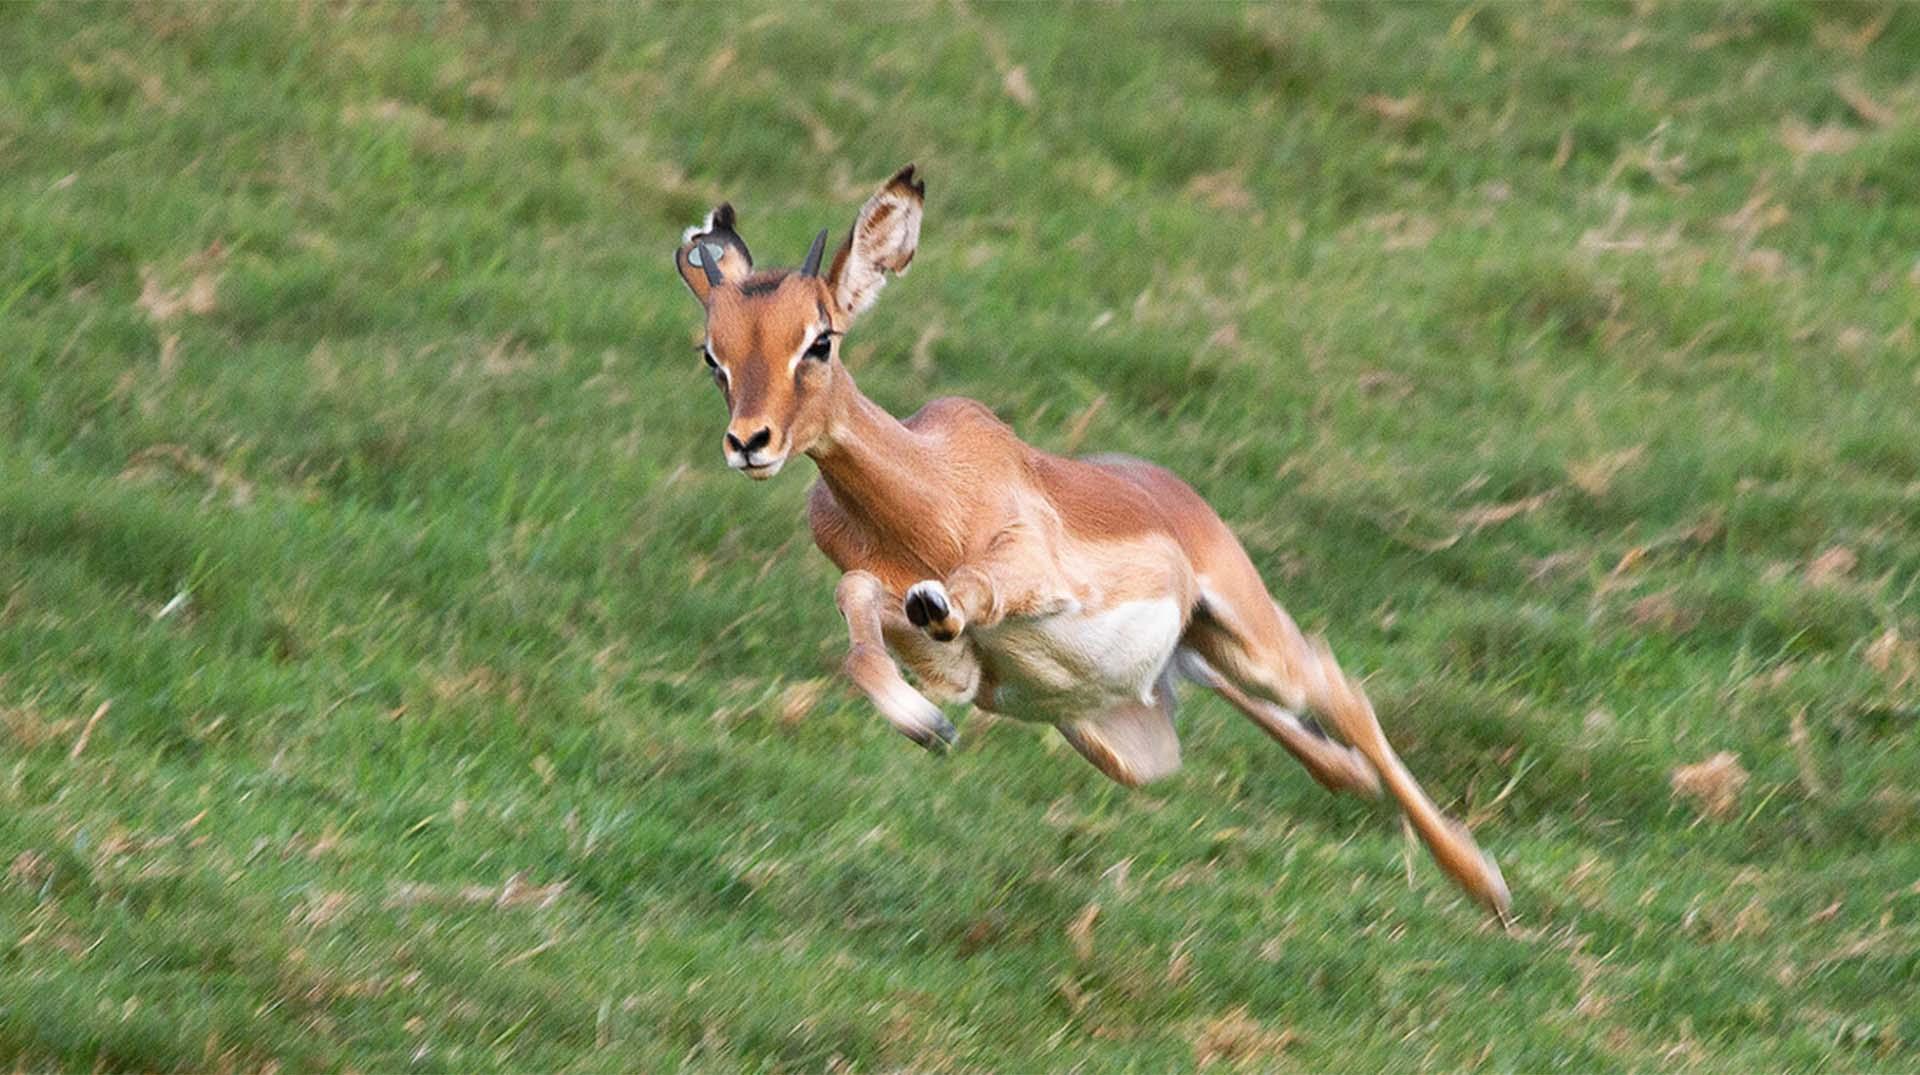 Antelope | San Diego Zoo Animals & Plants